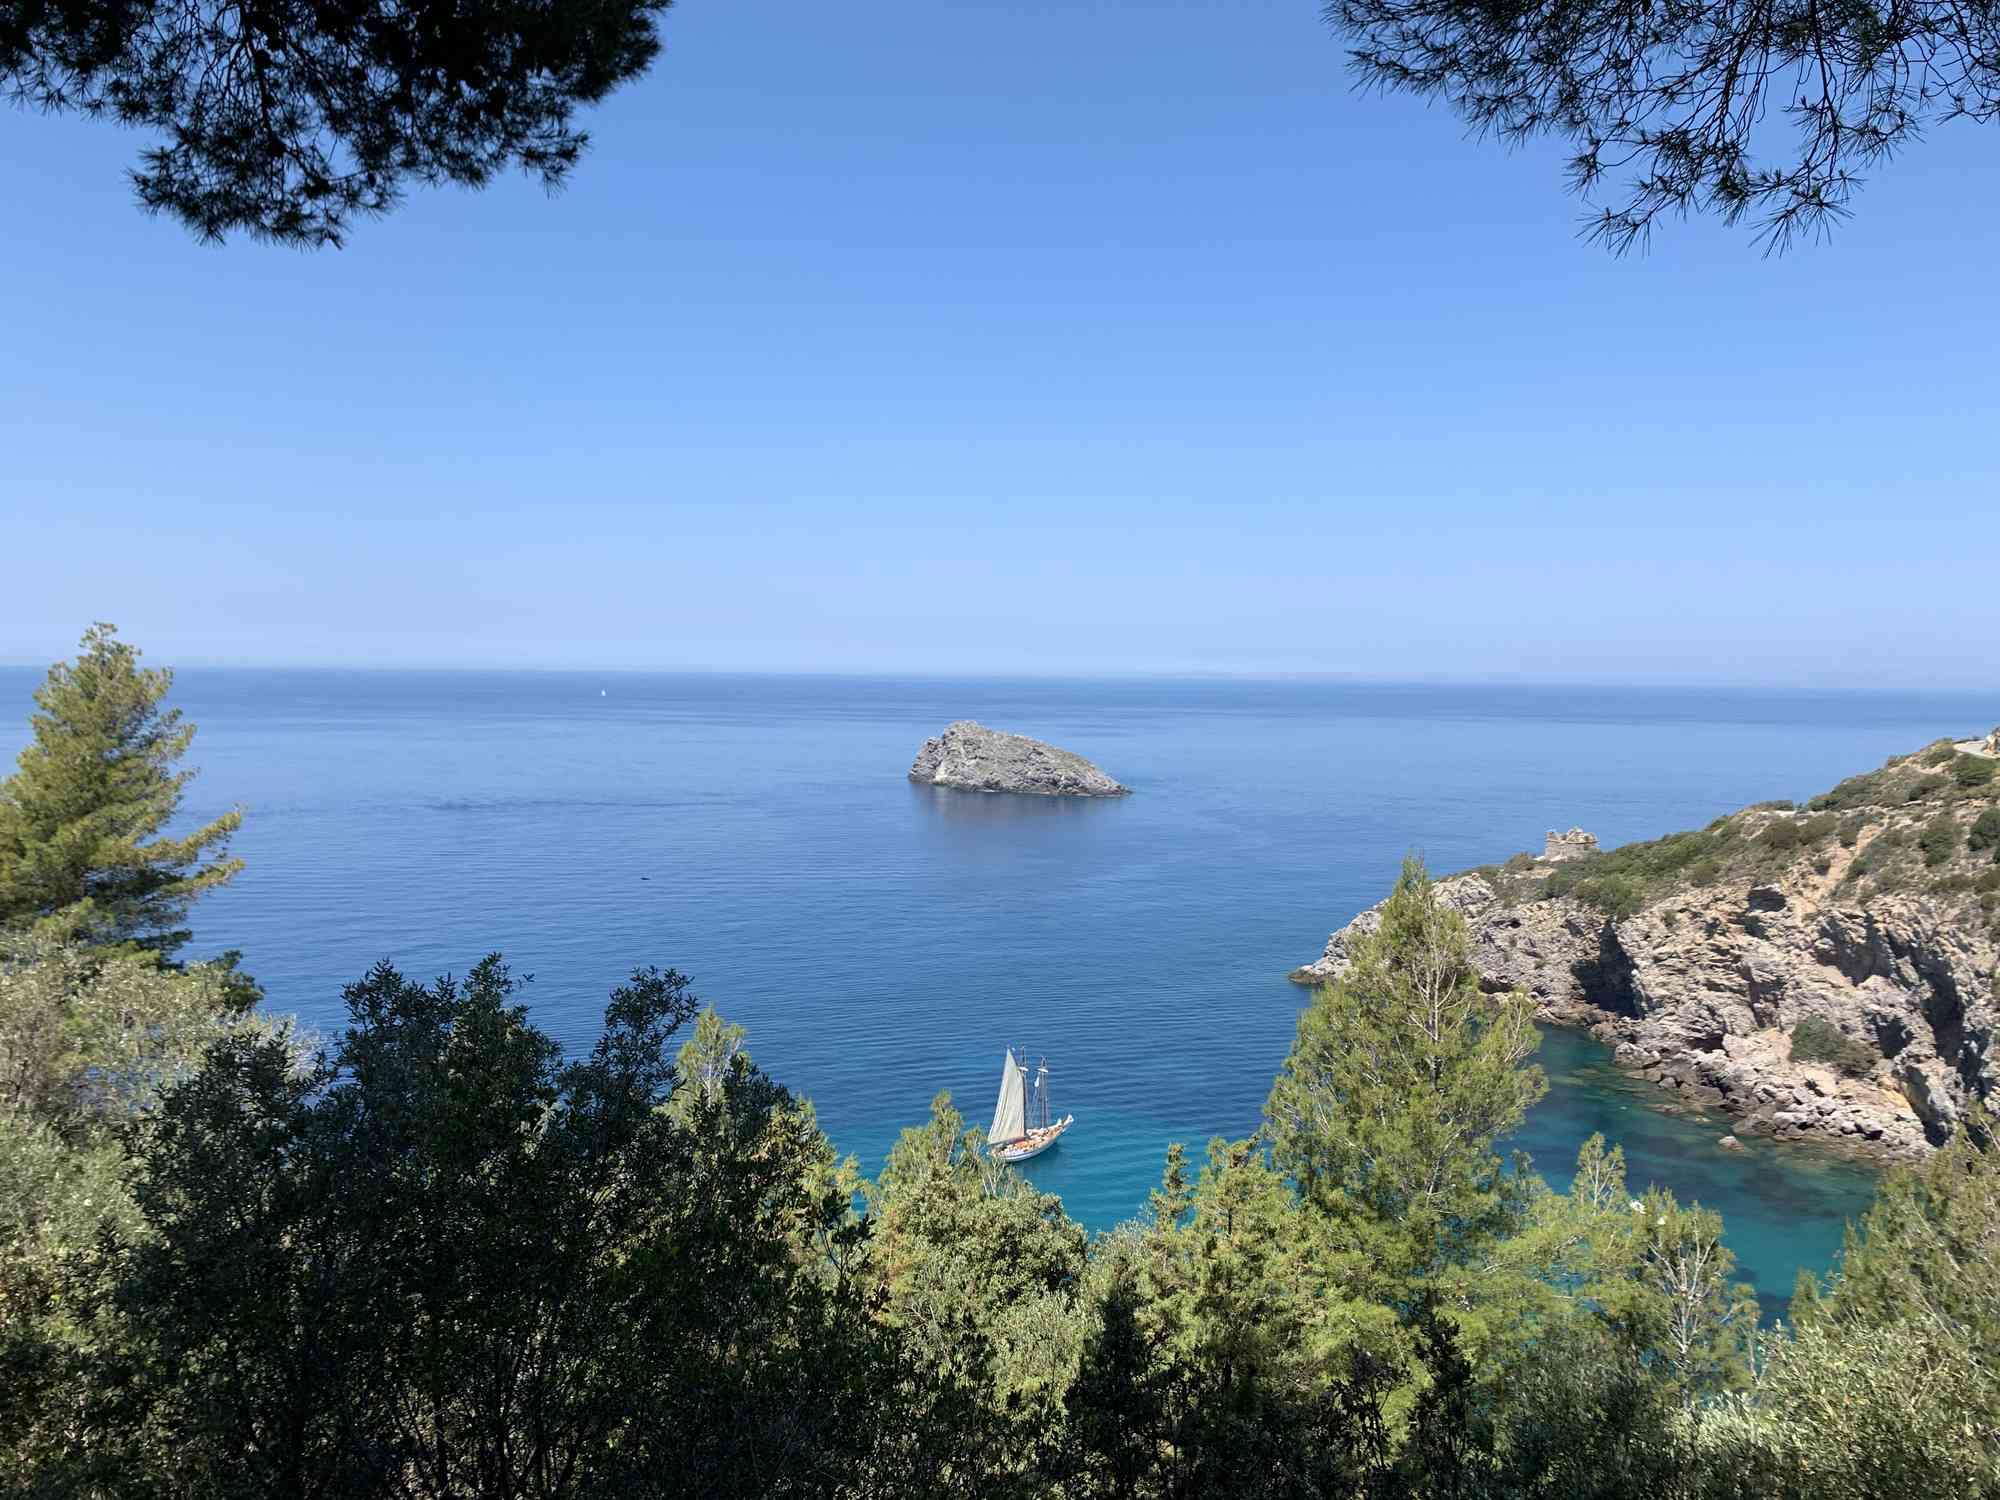 The cove at Cala di Gesso, Monte Argentario